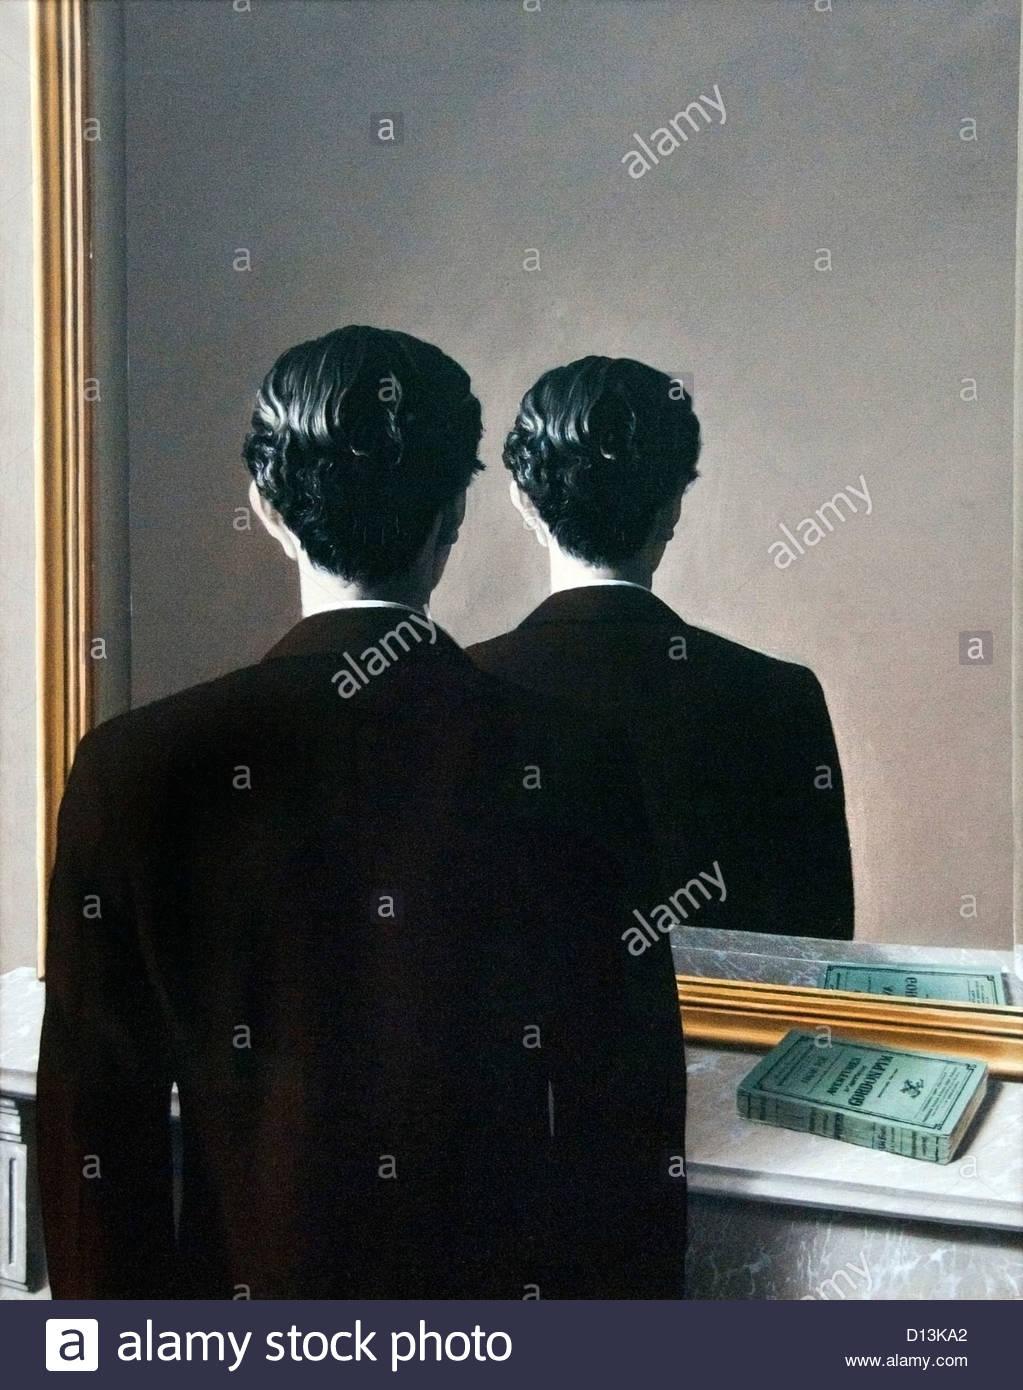 La Reproduction interdite 1937 Reproduction Prohibited by René Magritte Belgium Belgian surrealist - Stock Image